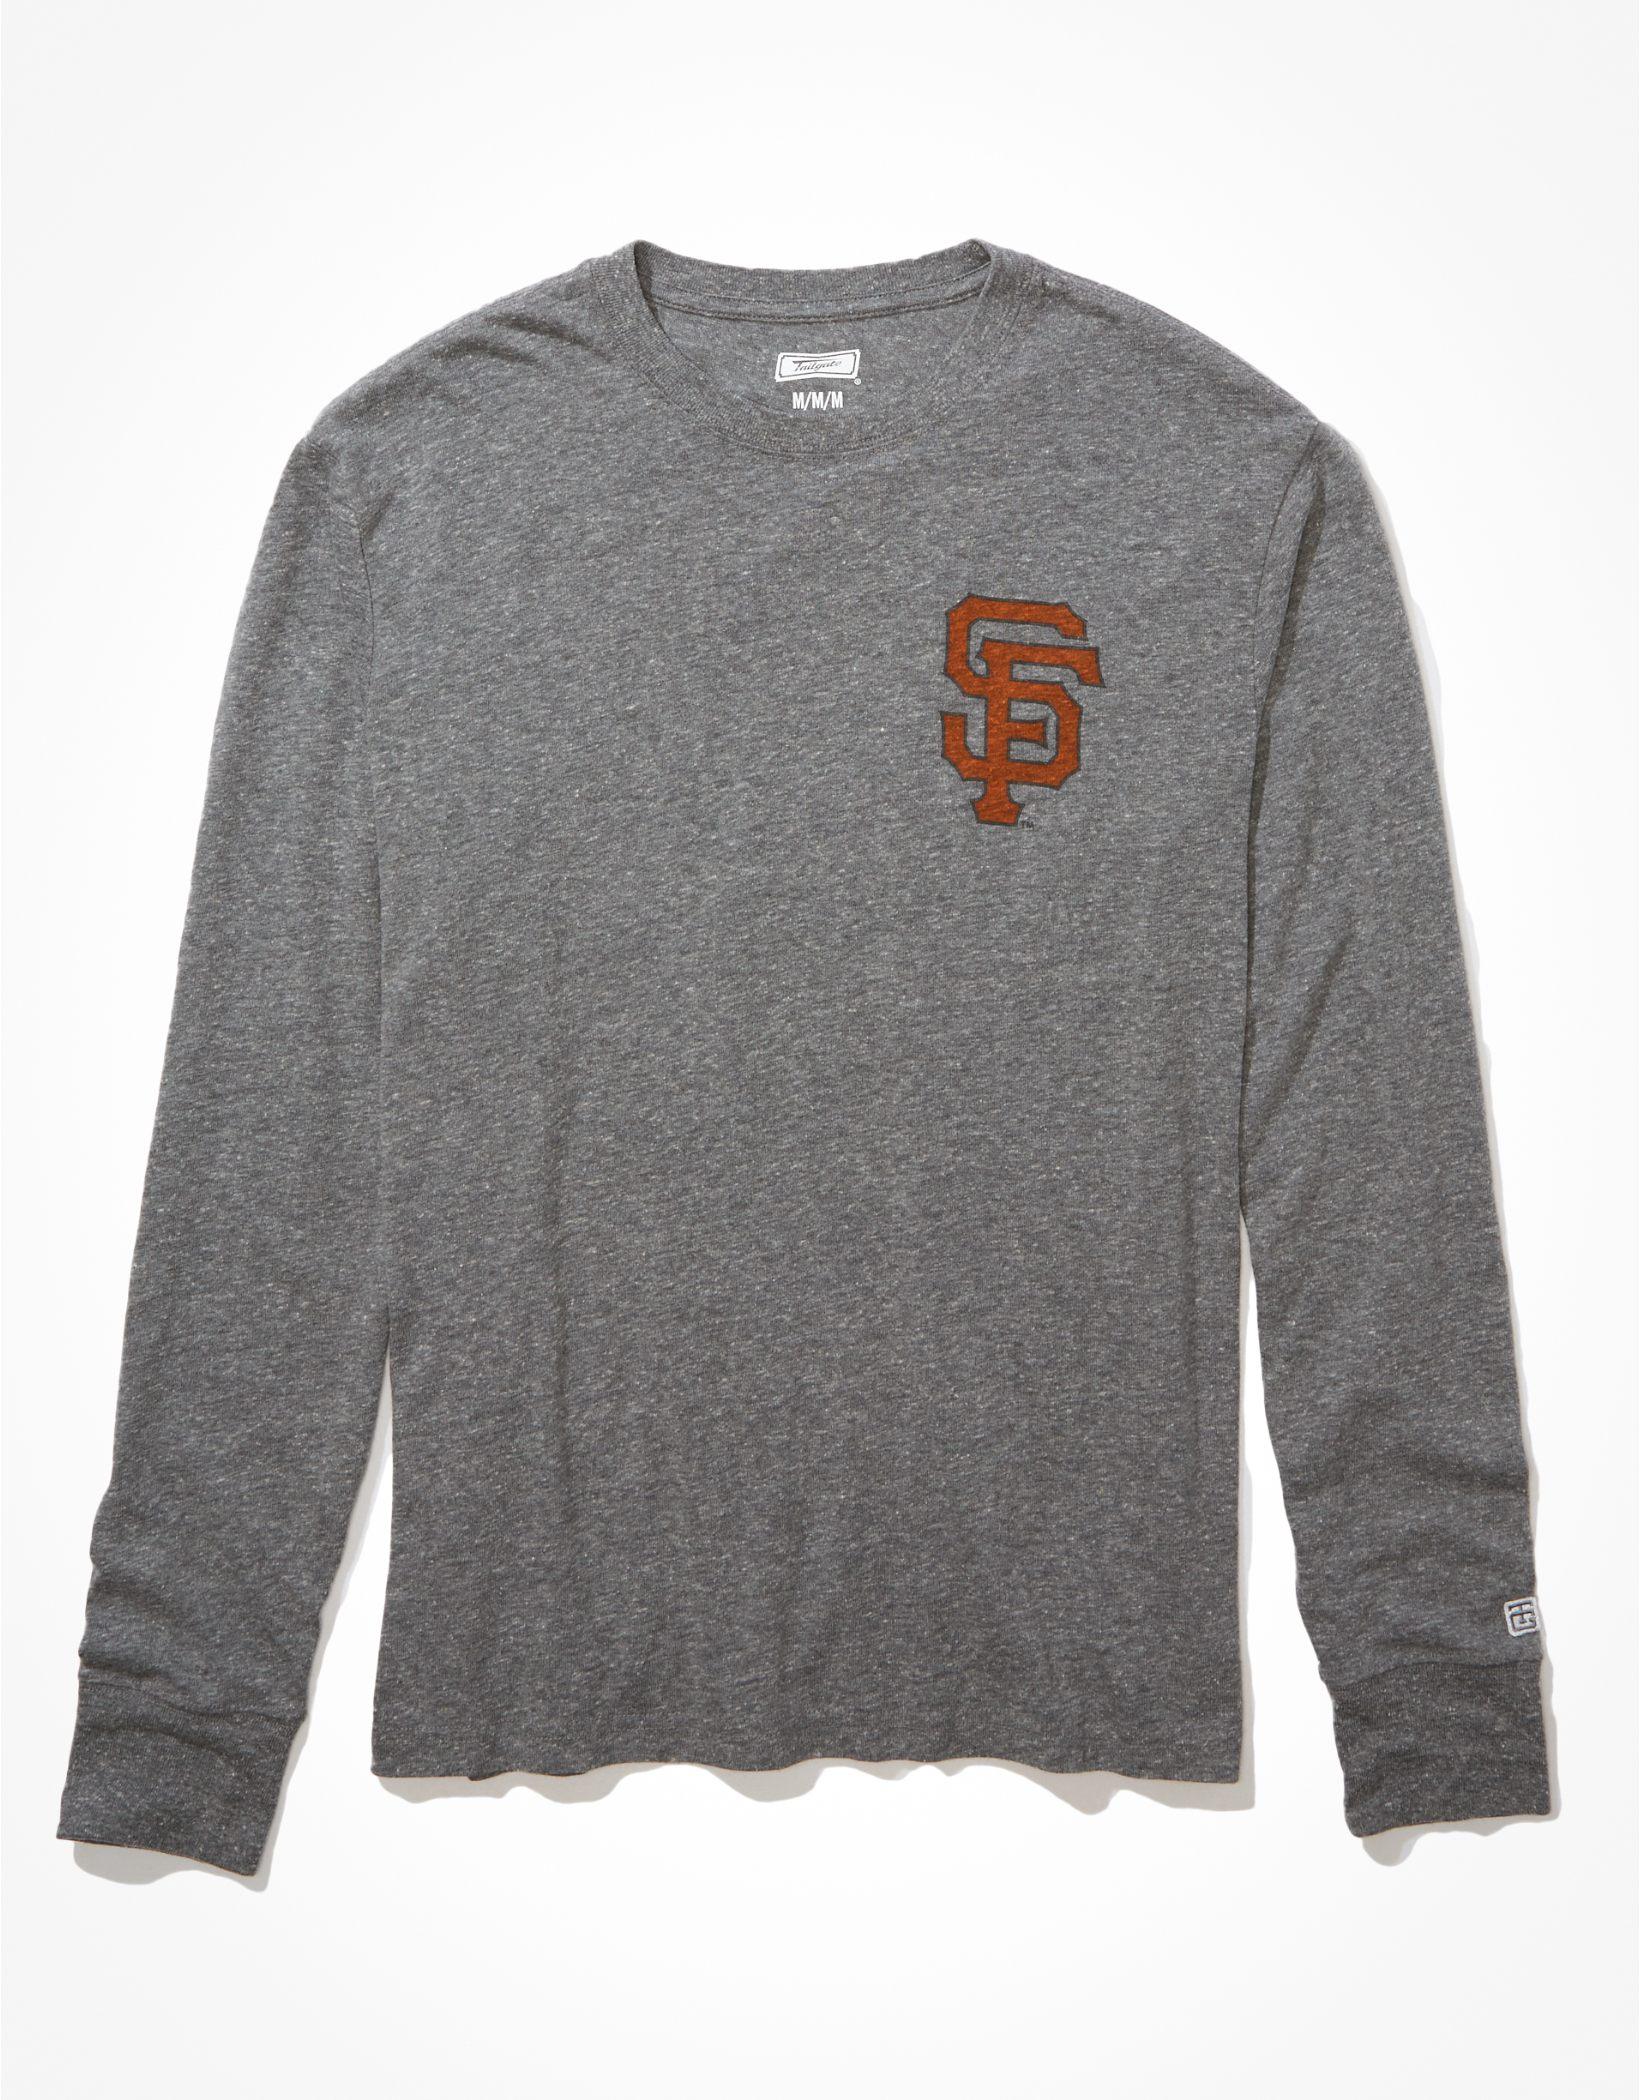 Tailgate Men's San Francisco Giants Long-Sleeve Graphic T-Shirt